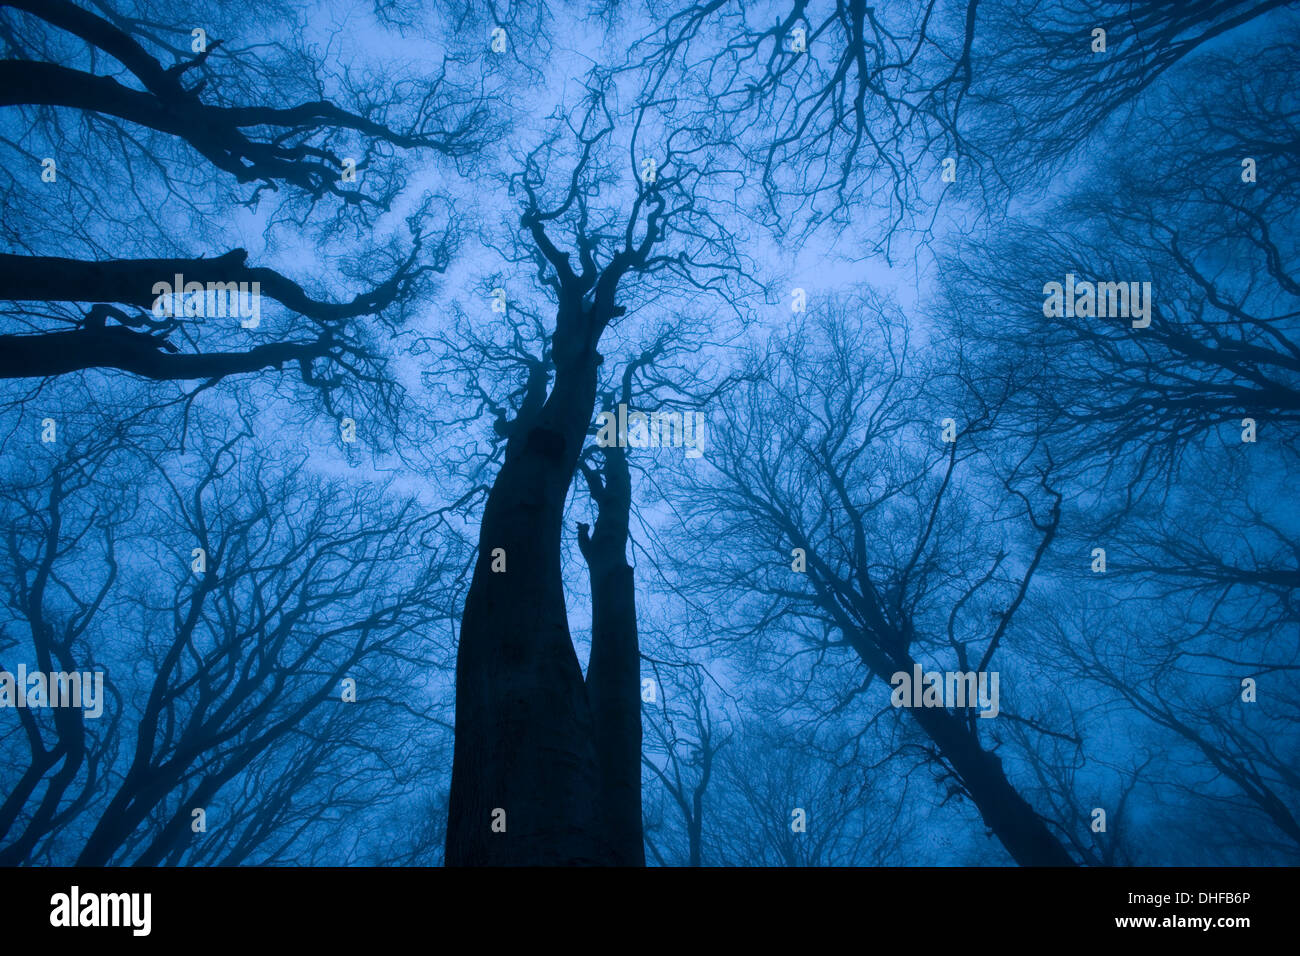 Tree canopy in winter, Felbrigg Woods, Norfolk, UK Stock Photo